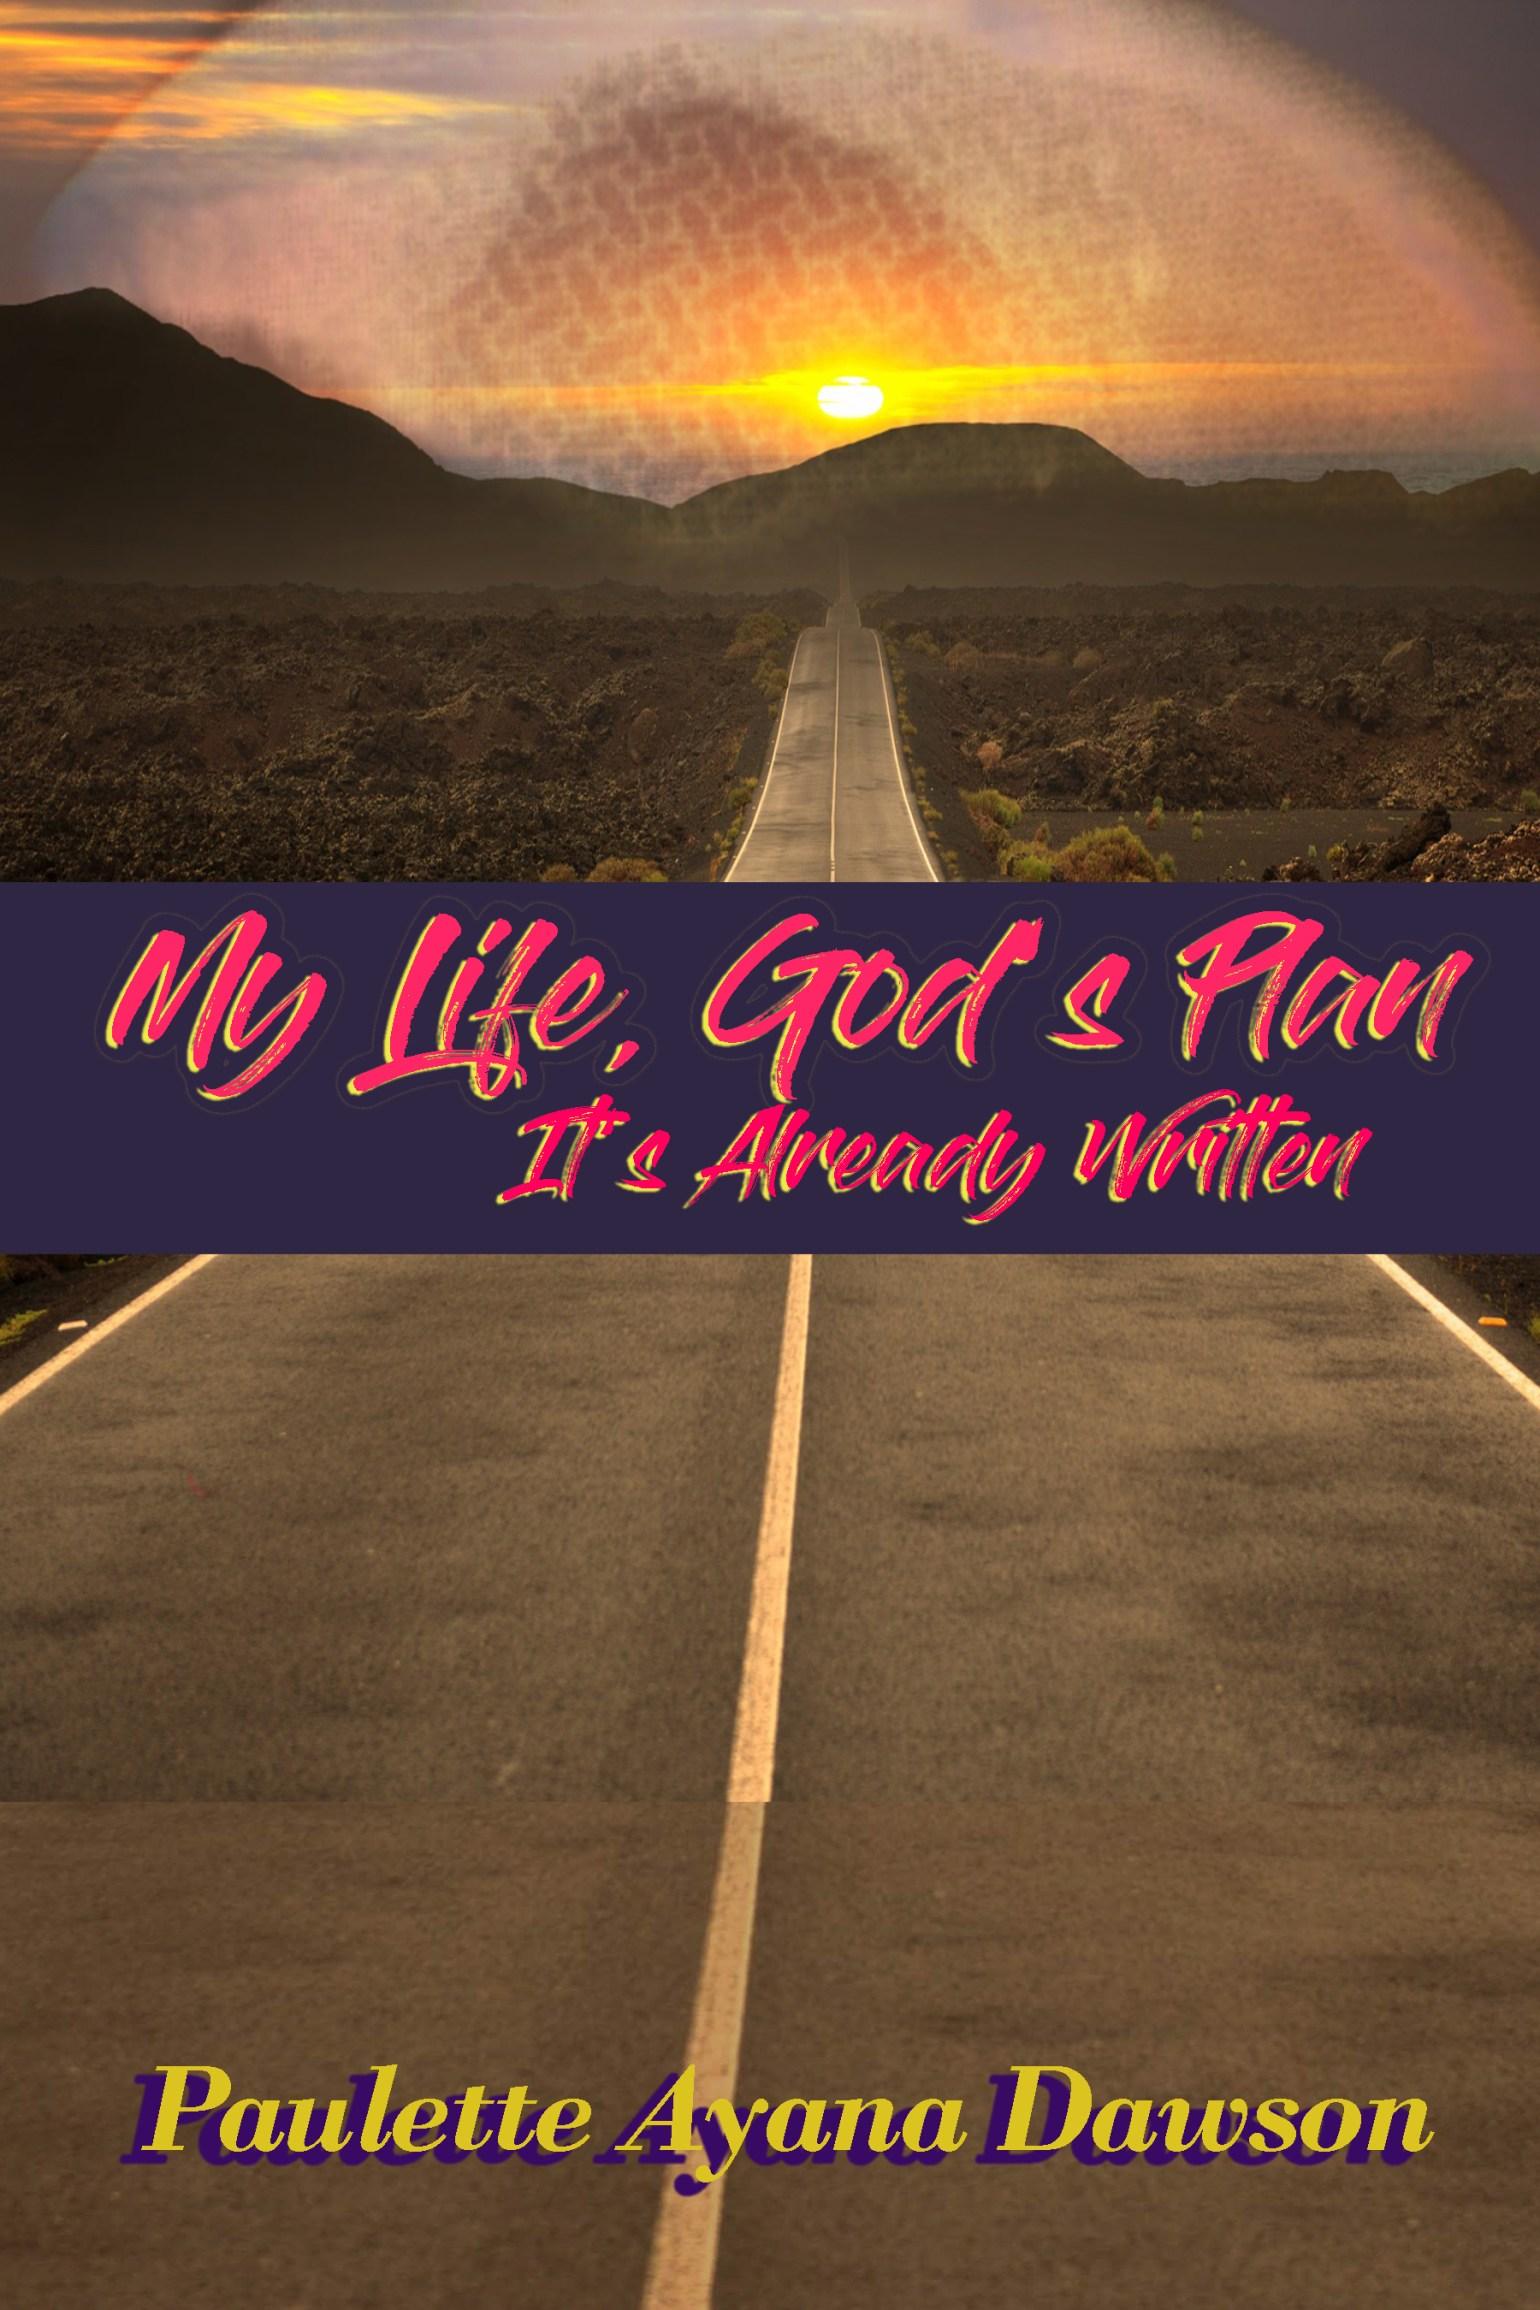 My Life, God's Plan: It's Already Written by Paulette Dawson 1642541826